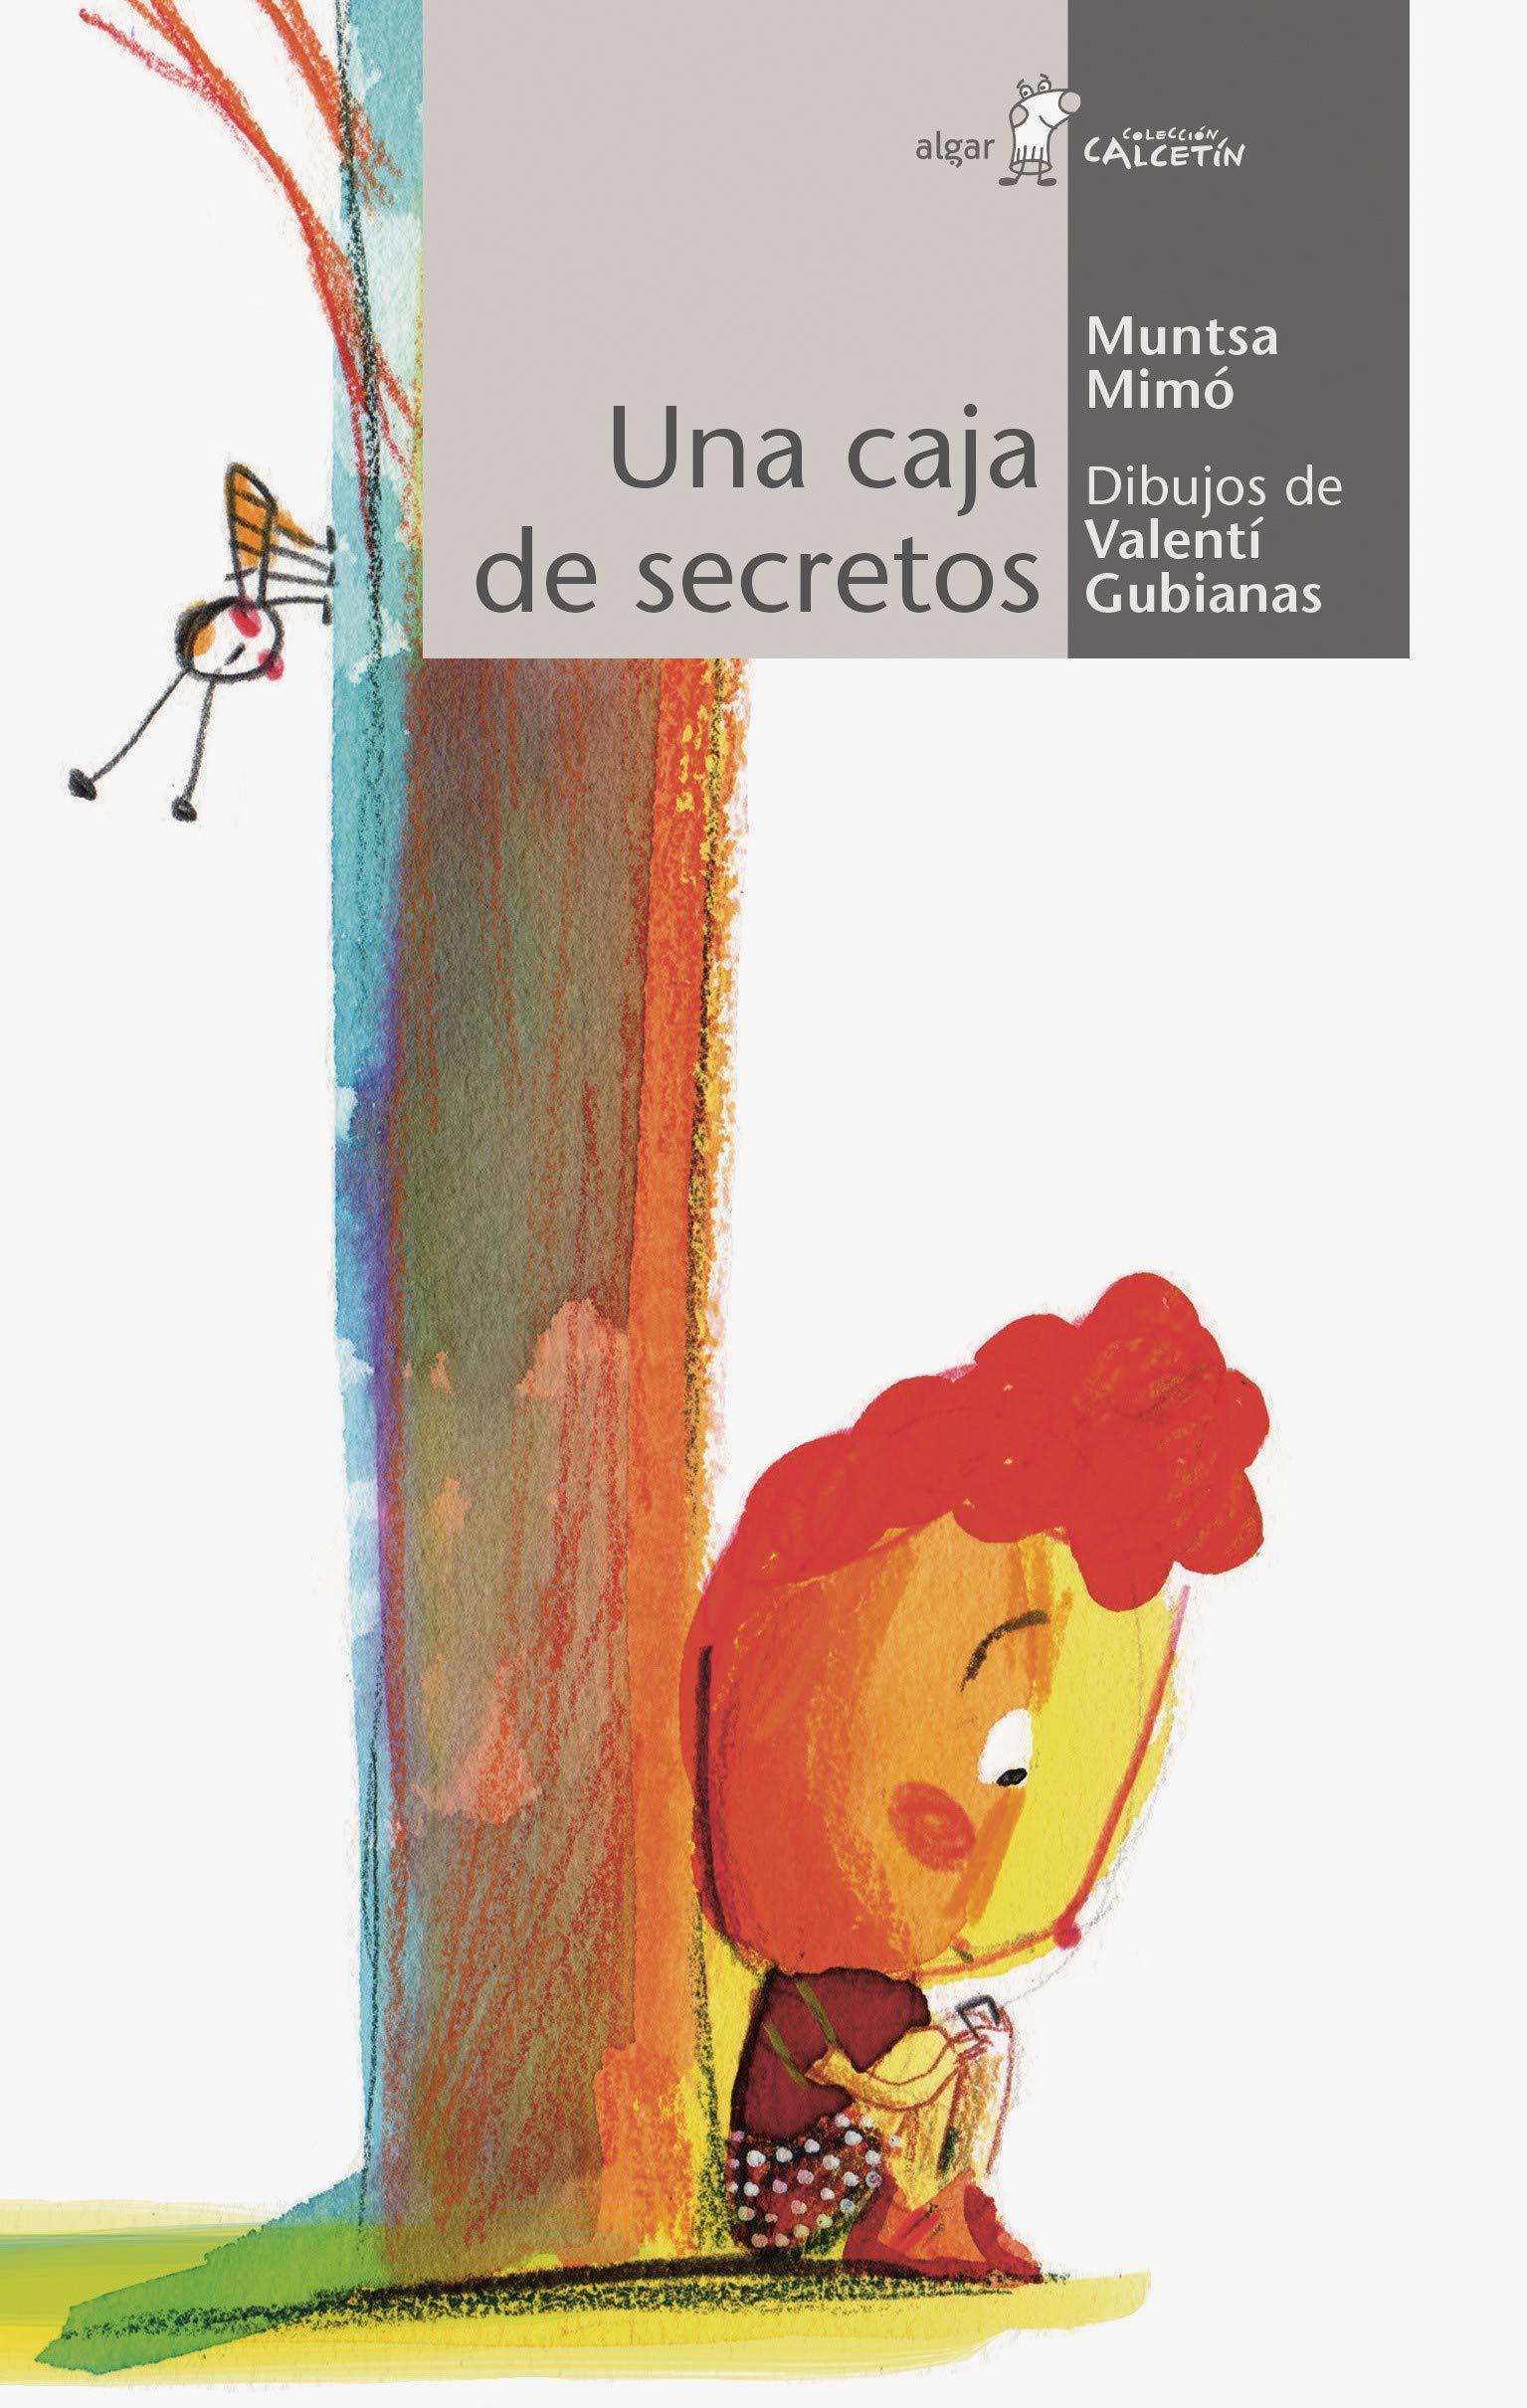 Una caja de secretos: 153 (Calcetín): Amazon.es: Mimó, Muntsa, Gubianas Escudé, Valentí, Broseta Fandos, Teresa: Libros